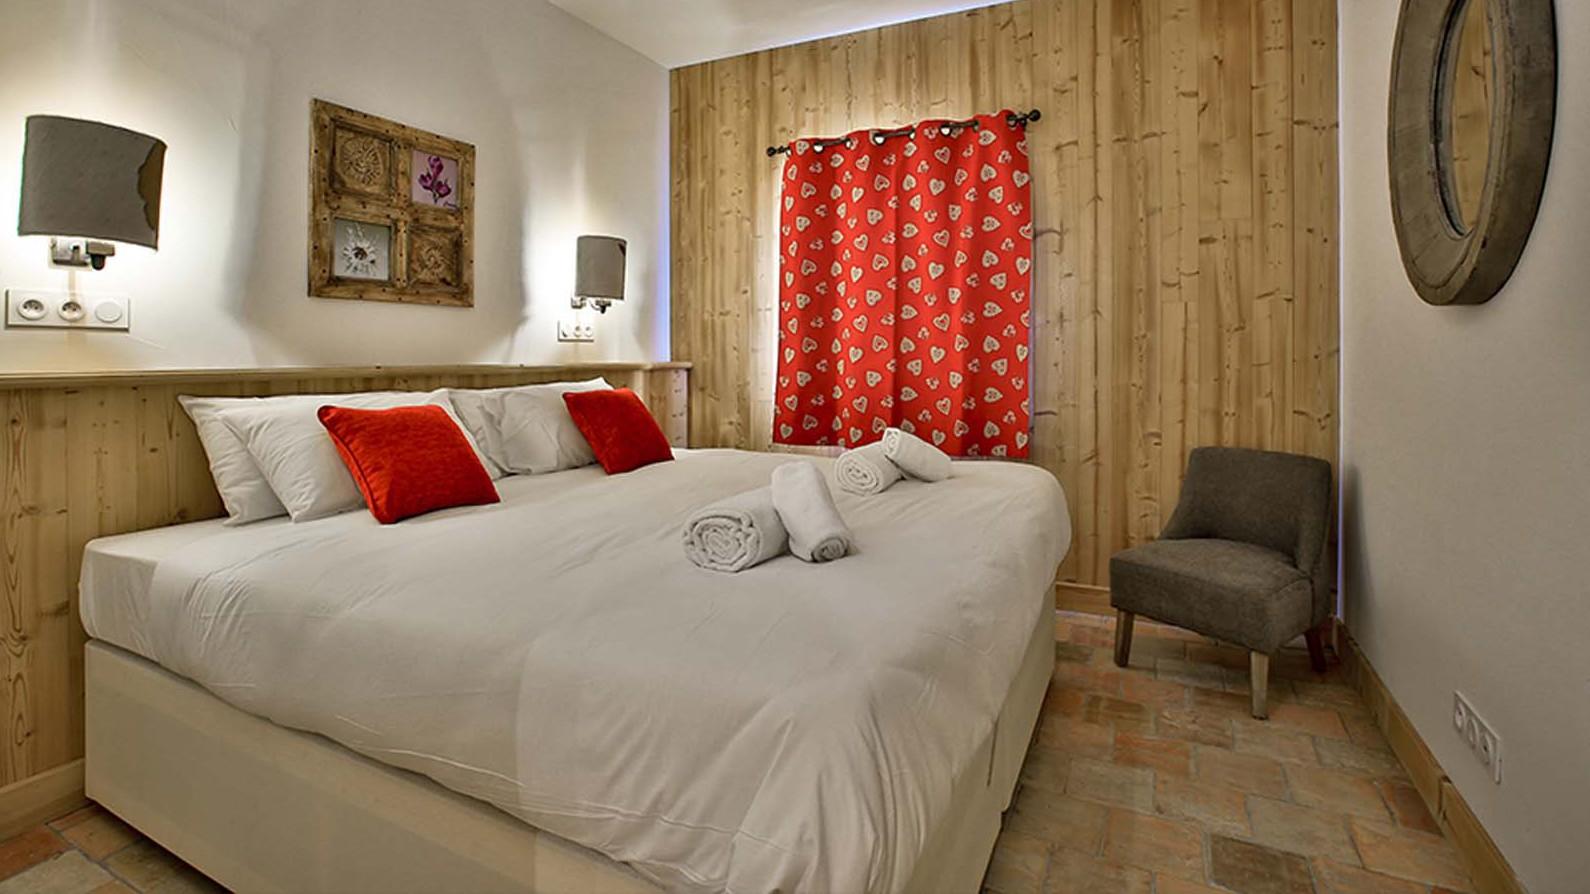 Bedroom - Chalet Campanula - Ski Chalet in La Plagne, France